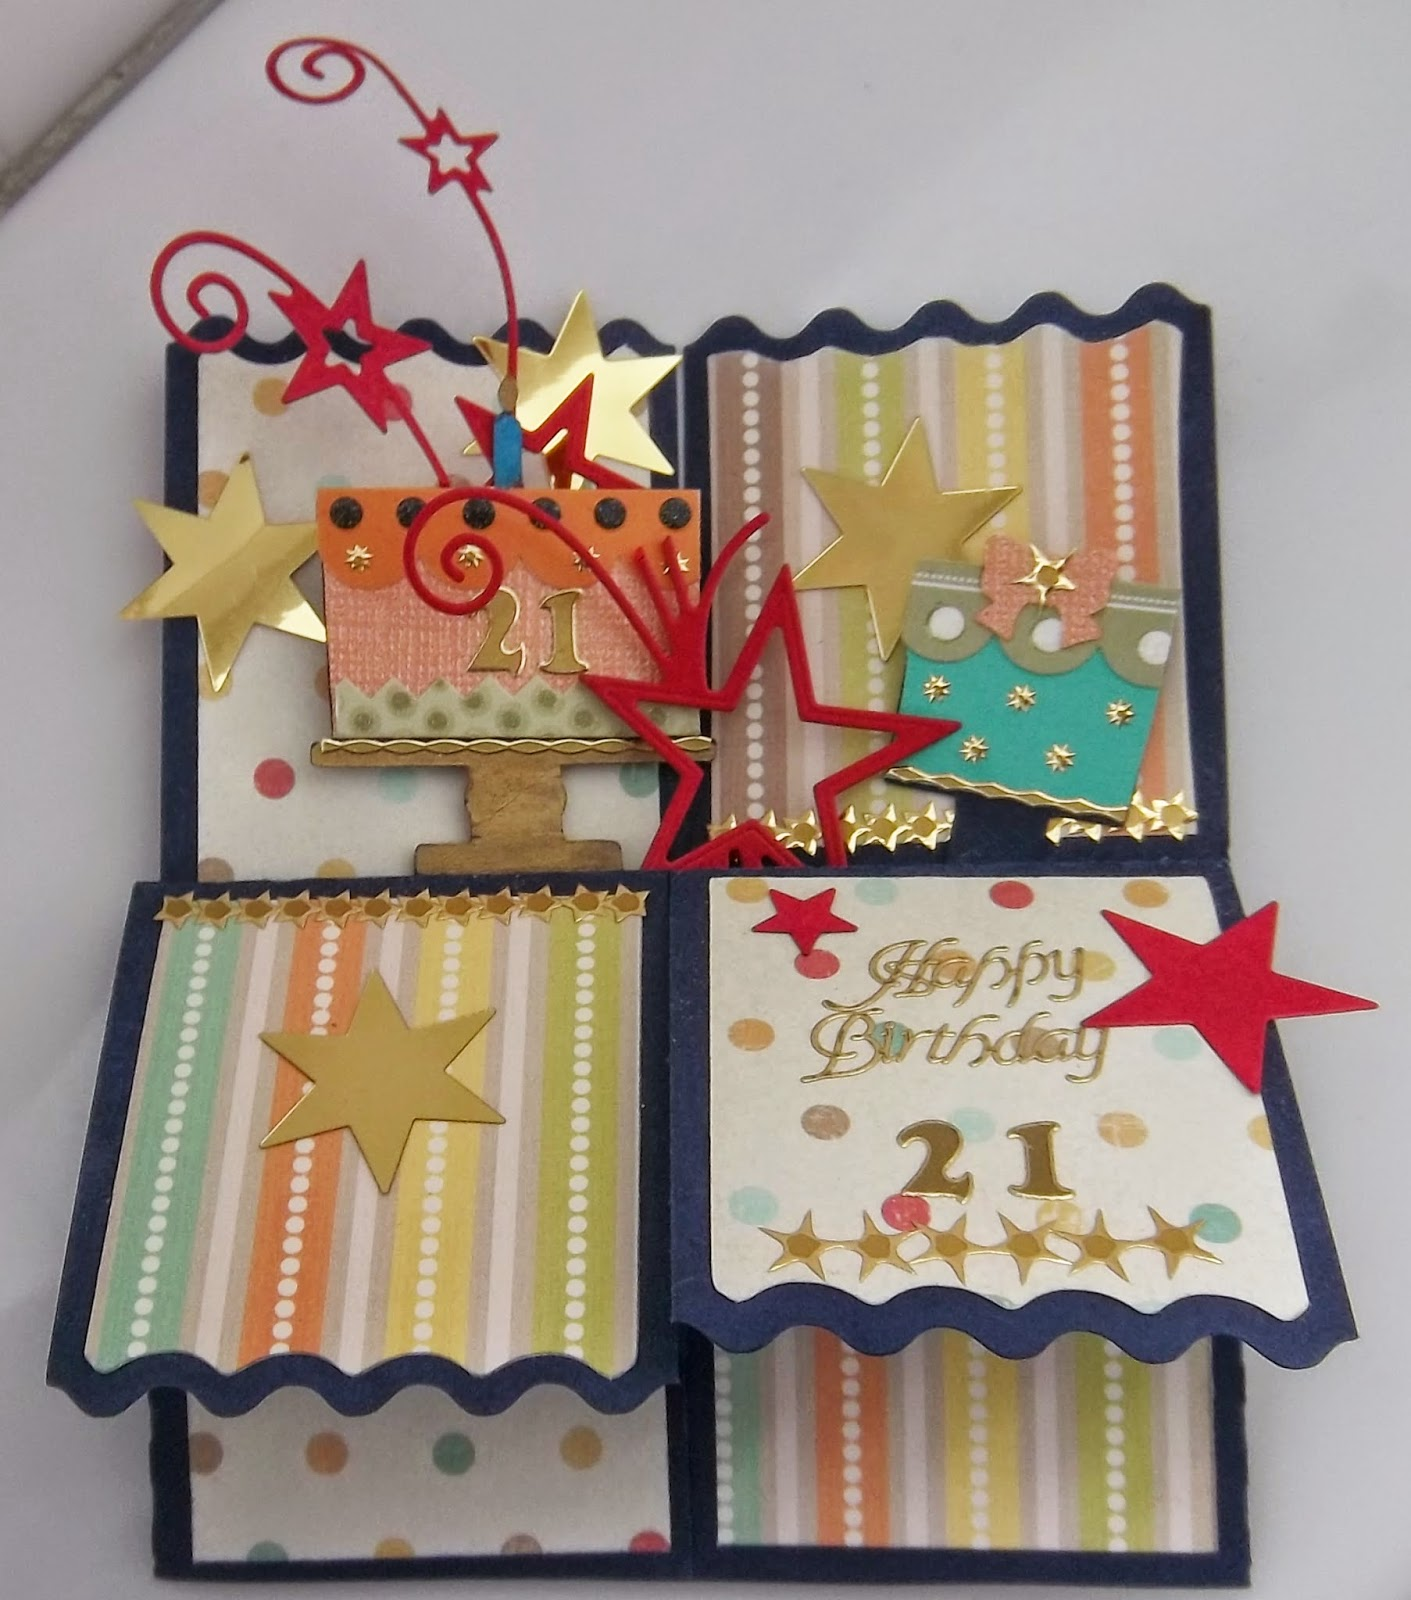 Cute Critter Cards Pop Up Box Card 21st Birthday